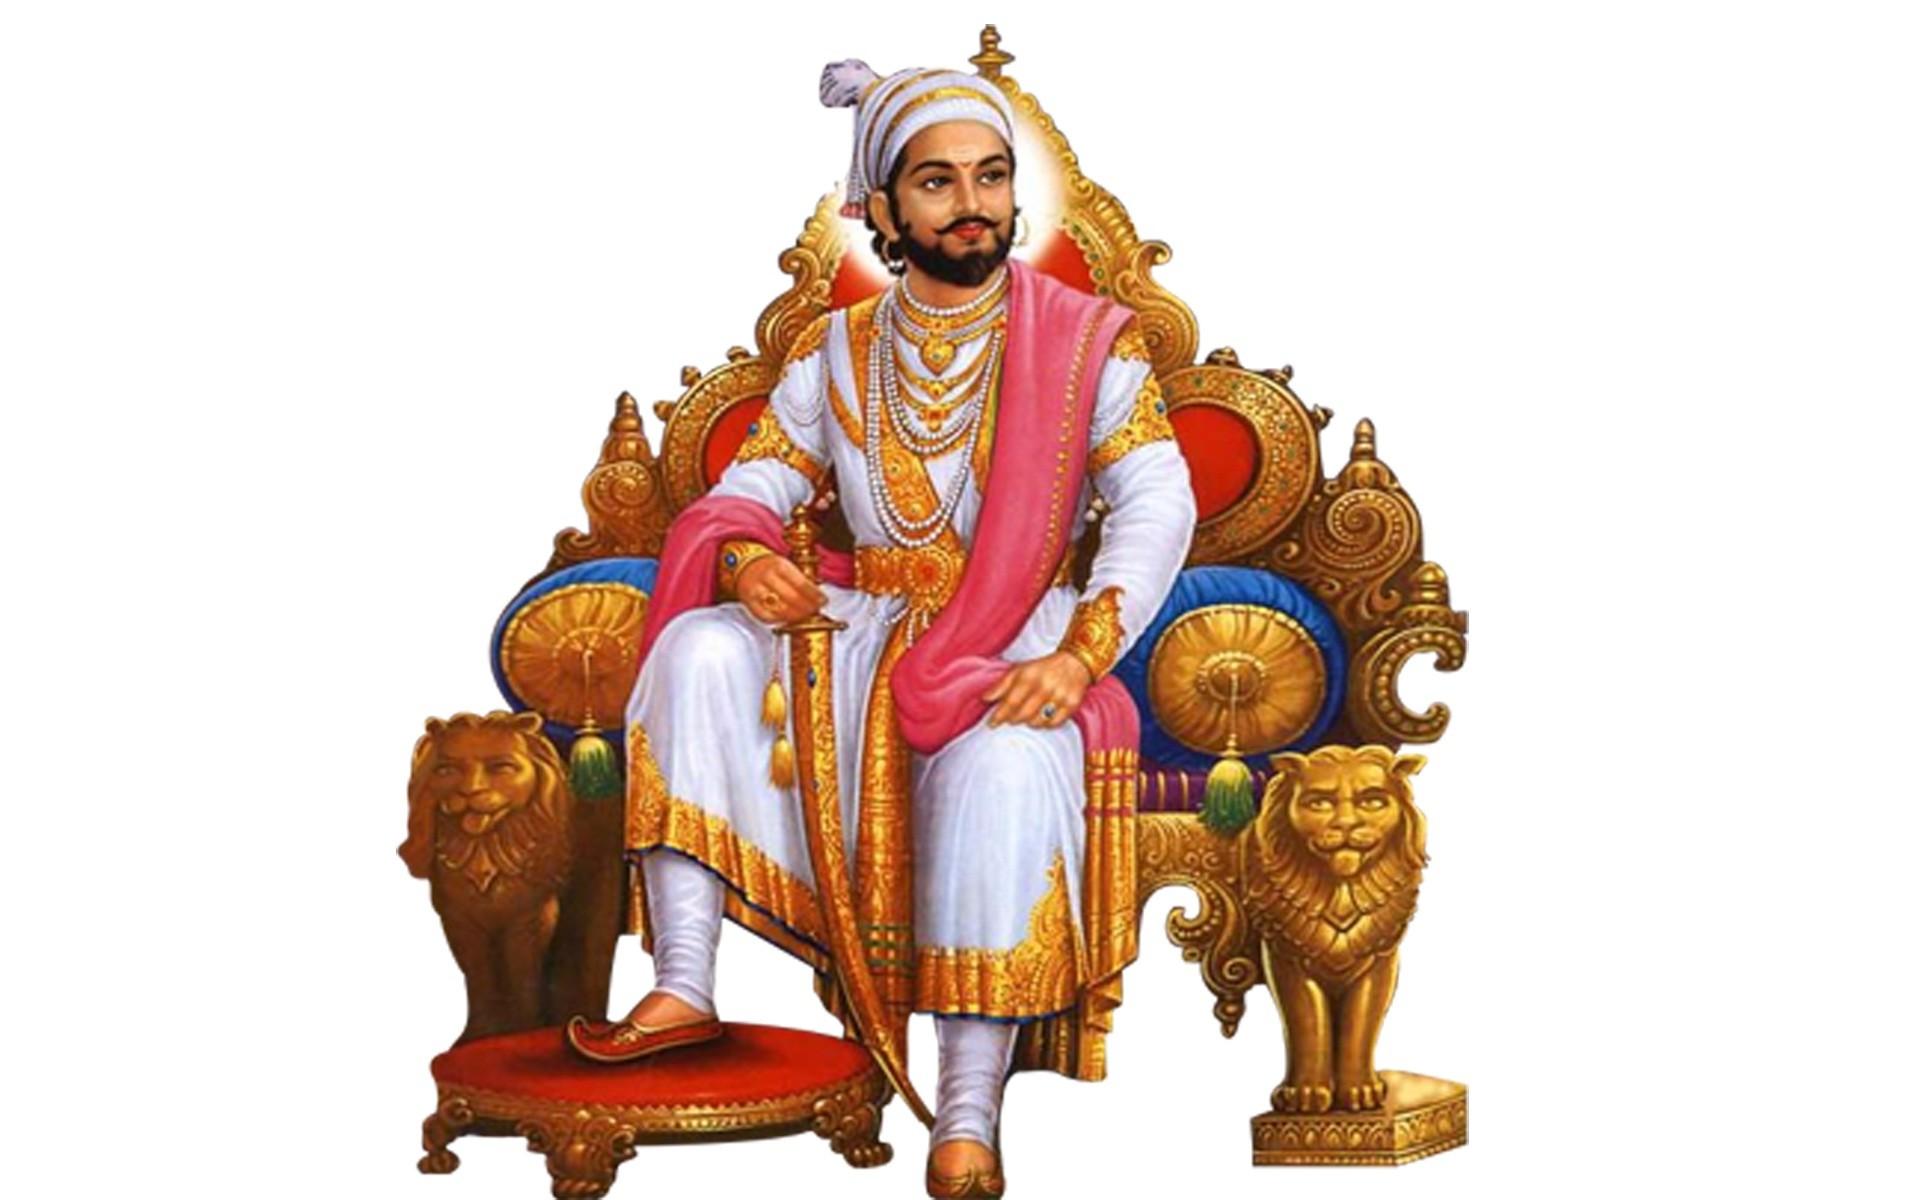 Shivaji Maharaj Wallpaper Images for PC Download